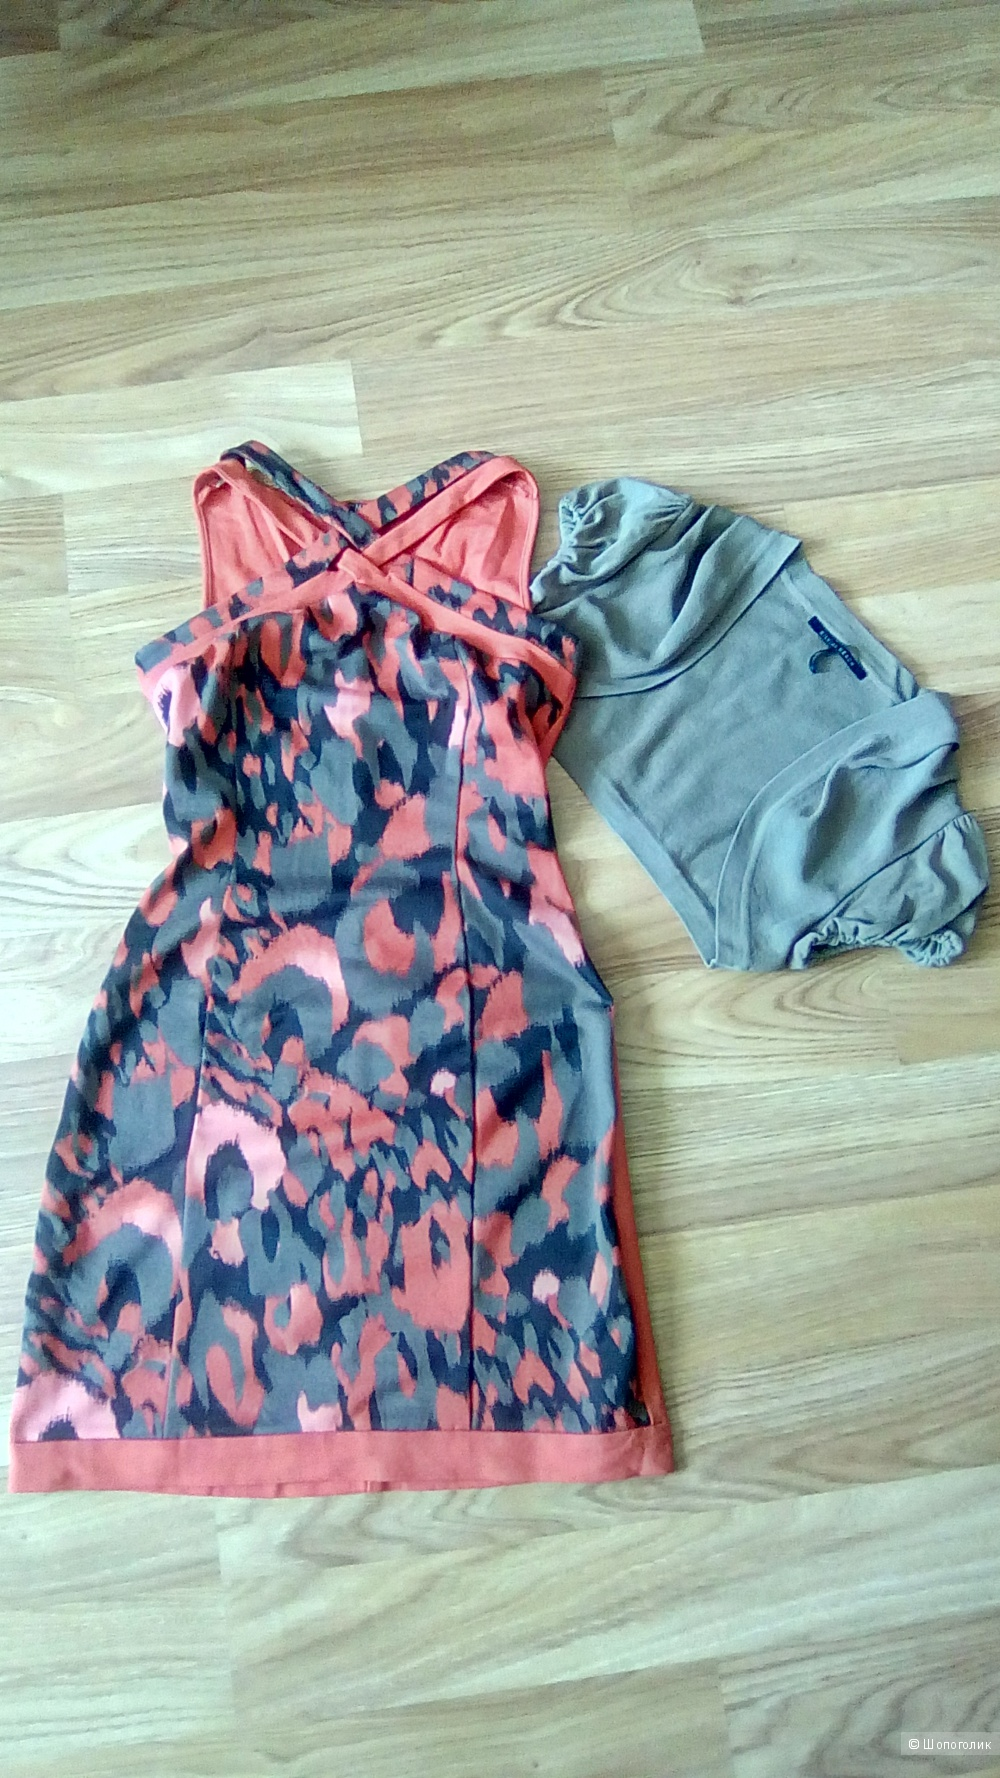 Сет Платье NEMO размерS и болеро SILVIAN HEACH размер S